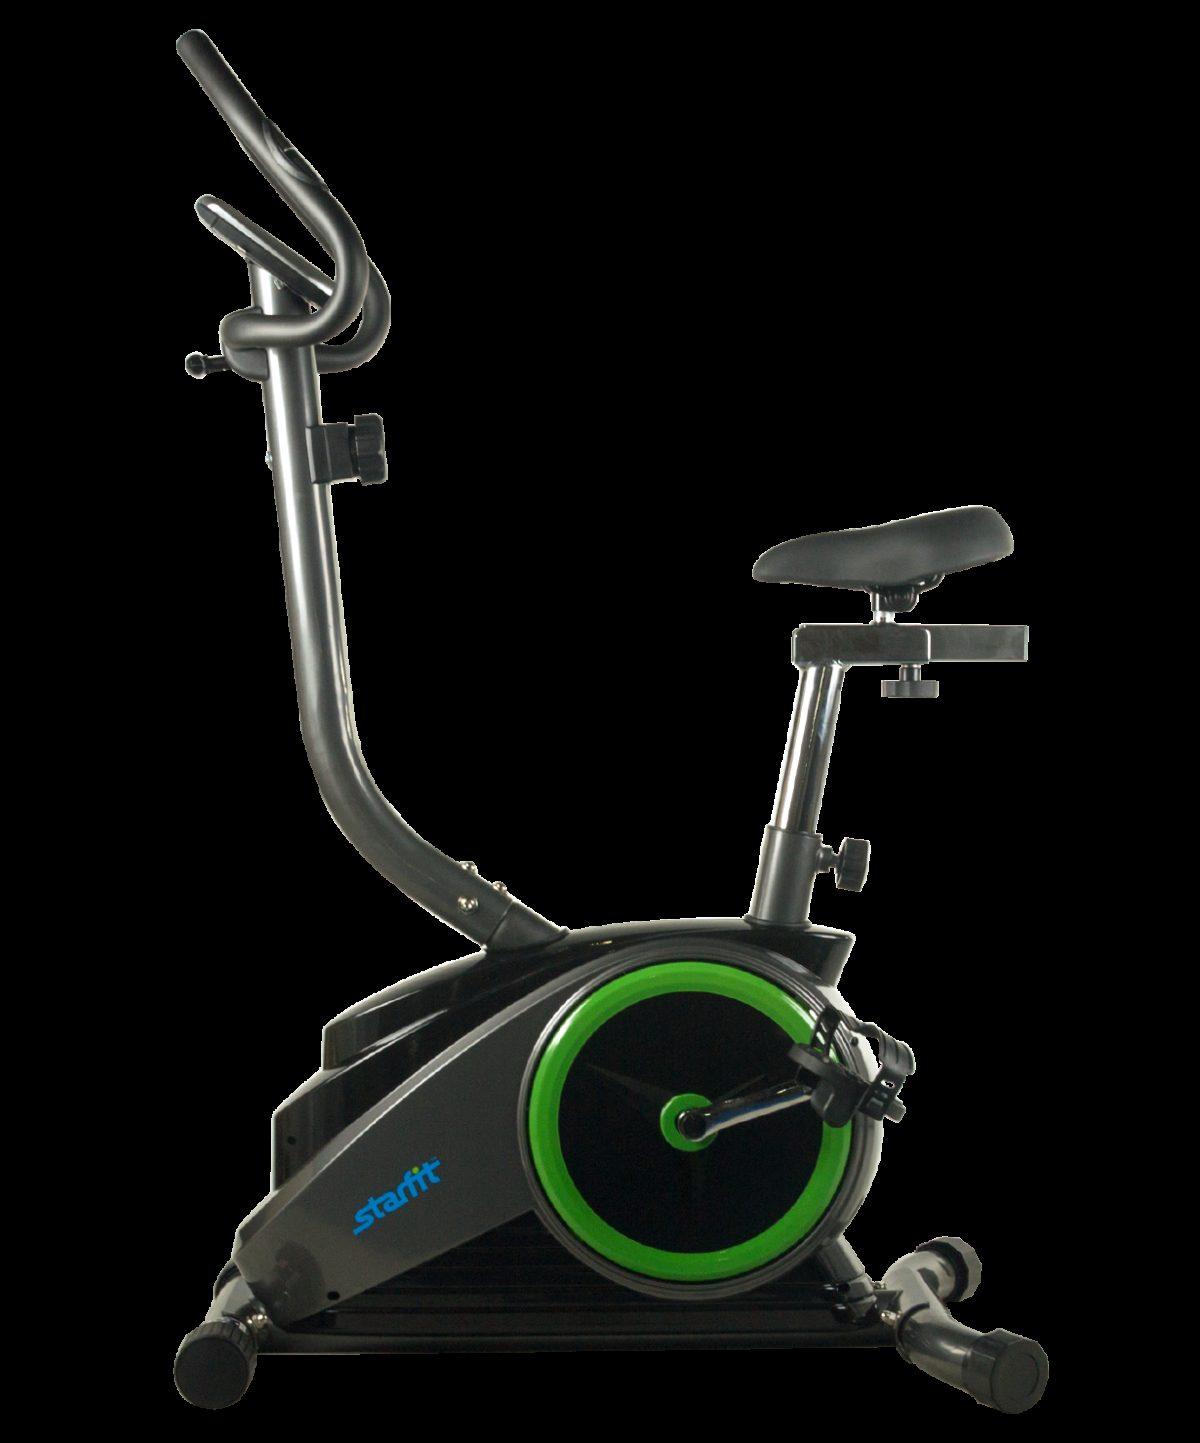 STARFIT Carrera велотренажер магнитный - 5